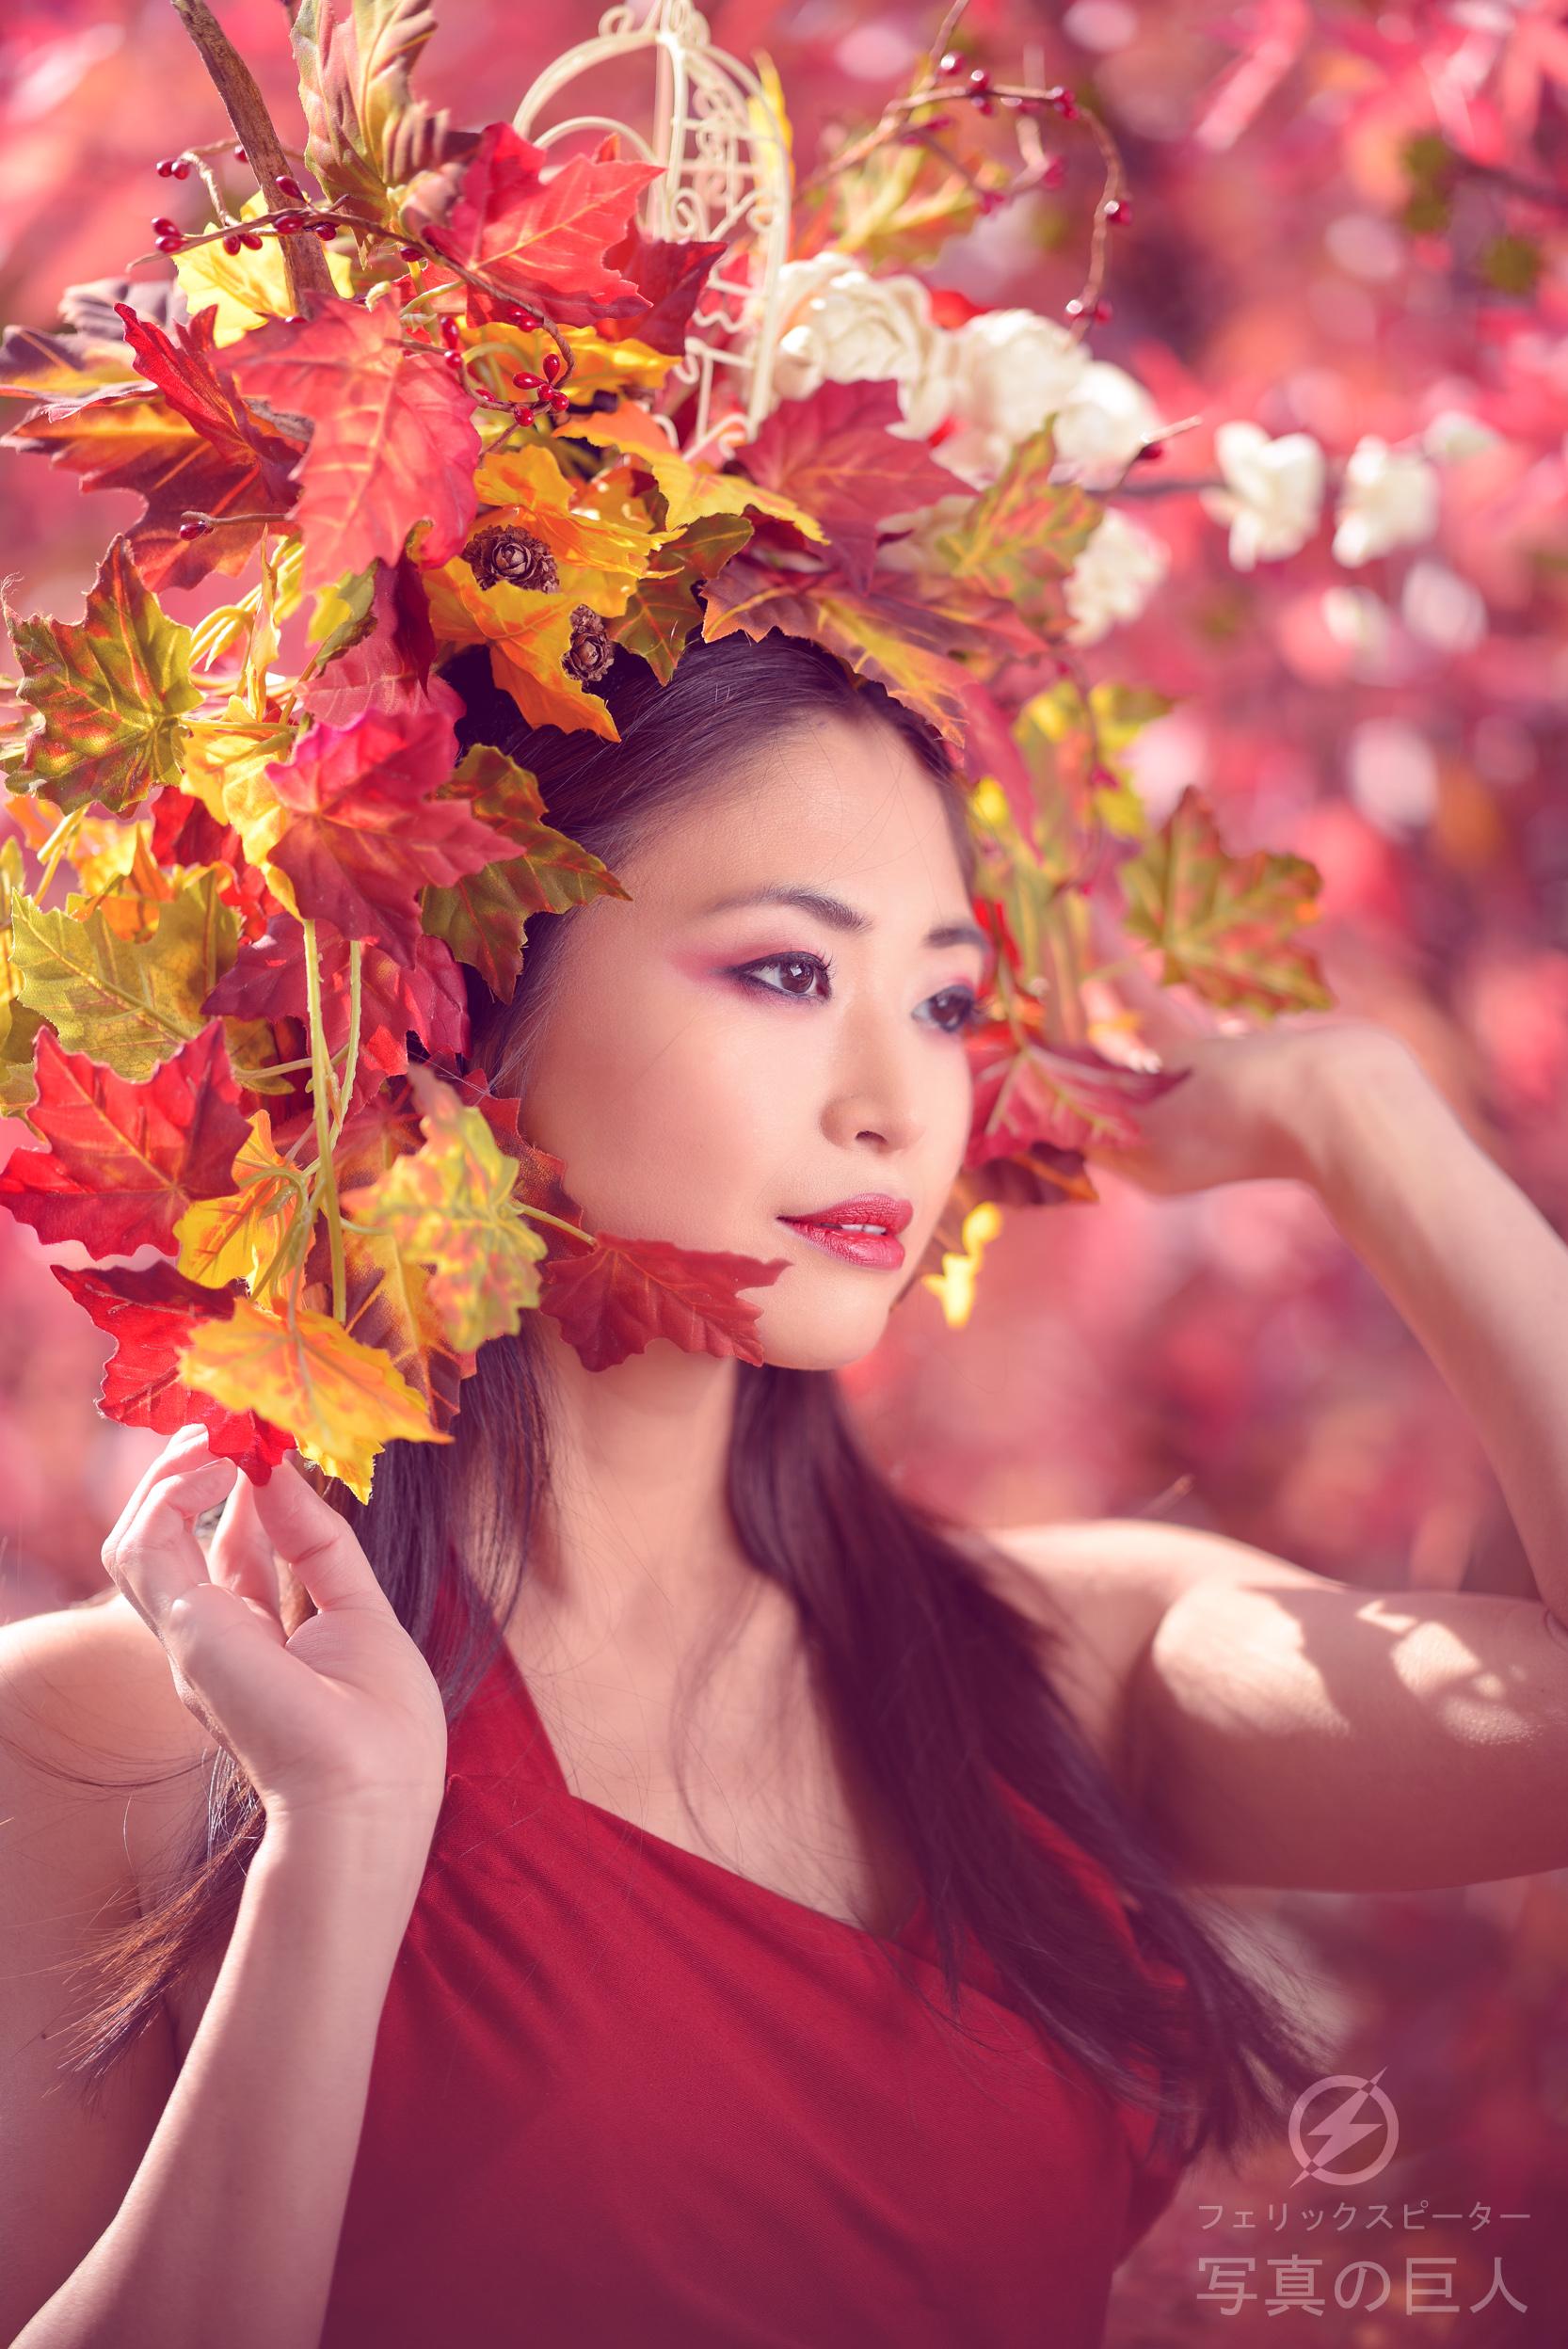 Japanese_Beautymodel_YuWi_FotoGigant_2.jpg